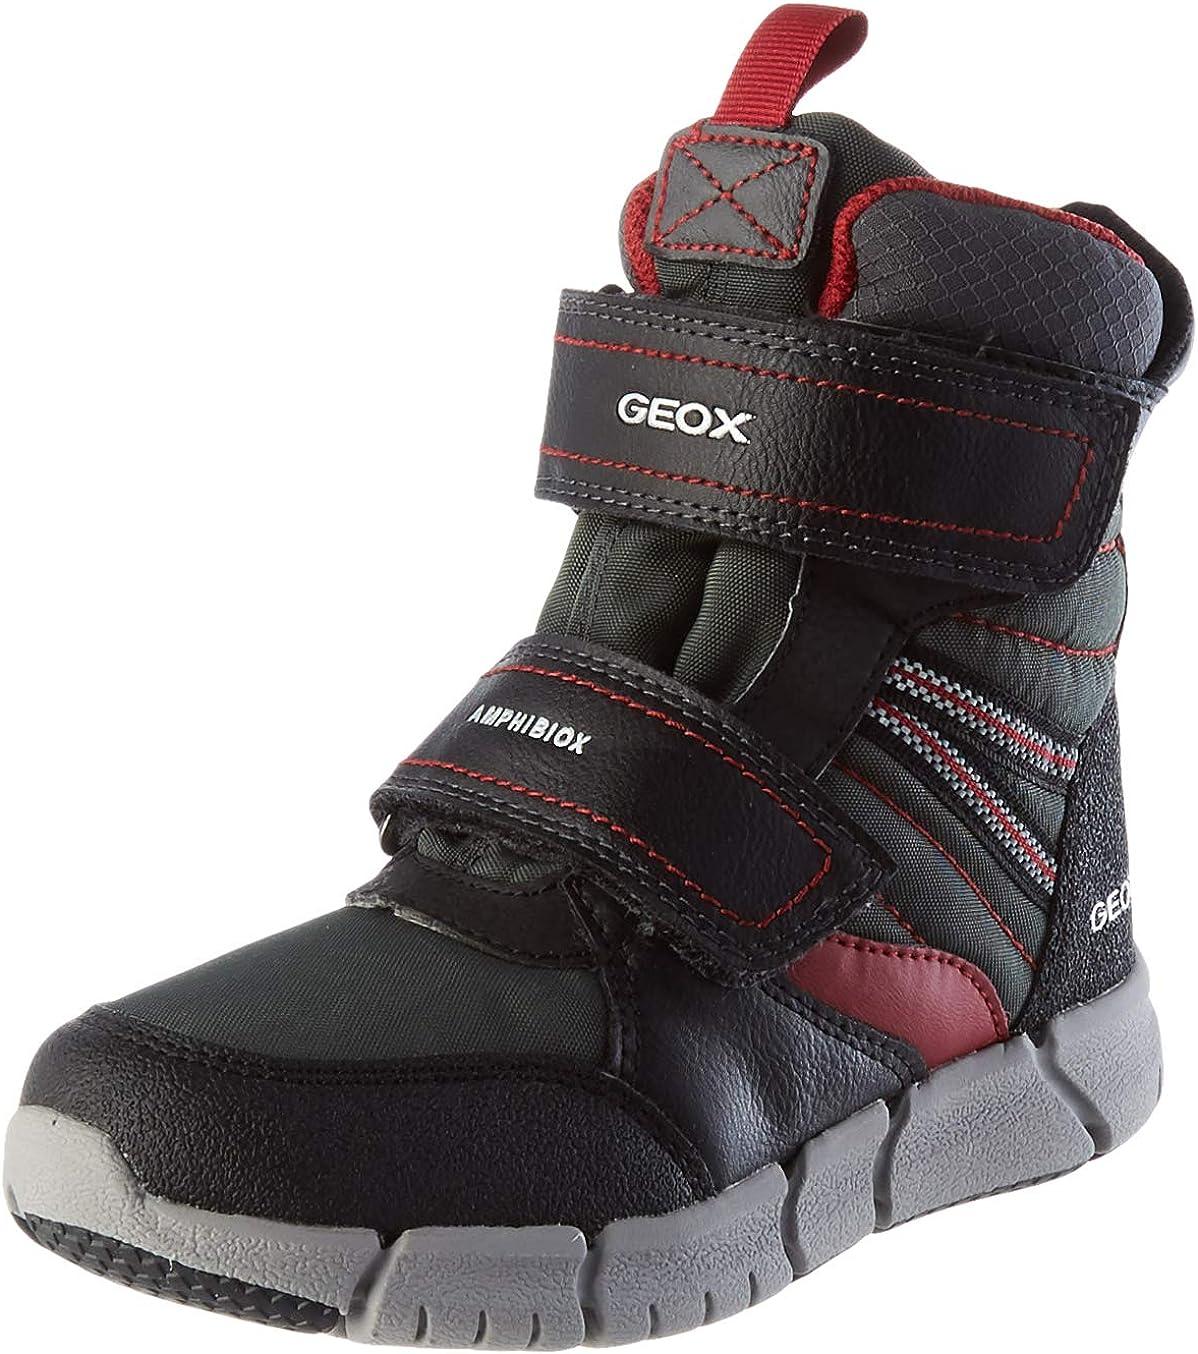 Geox Men's OFFicial store J FLEXYPER BOY B ABX outlet Dk Black Snow Red Boot 8